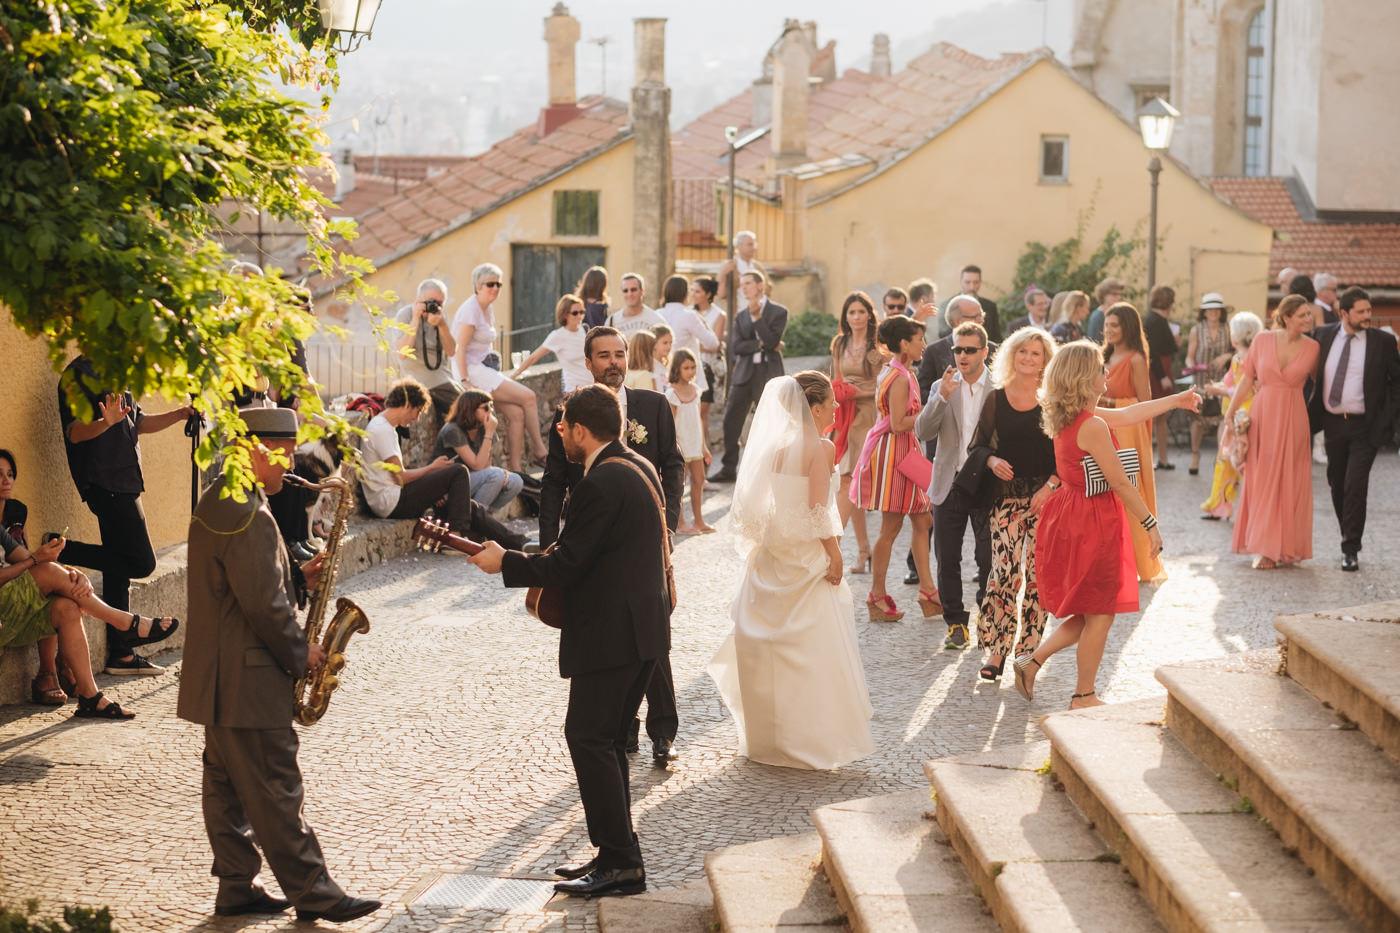 matrimoni_all_italiana_fotografo_matrimonio_cinque_terre-56.jpg